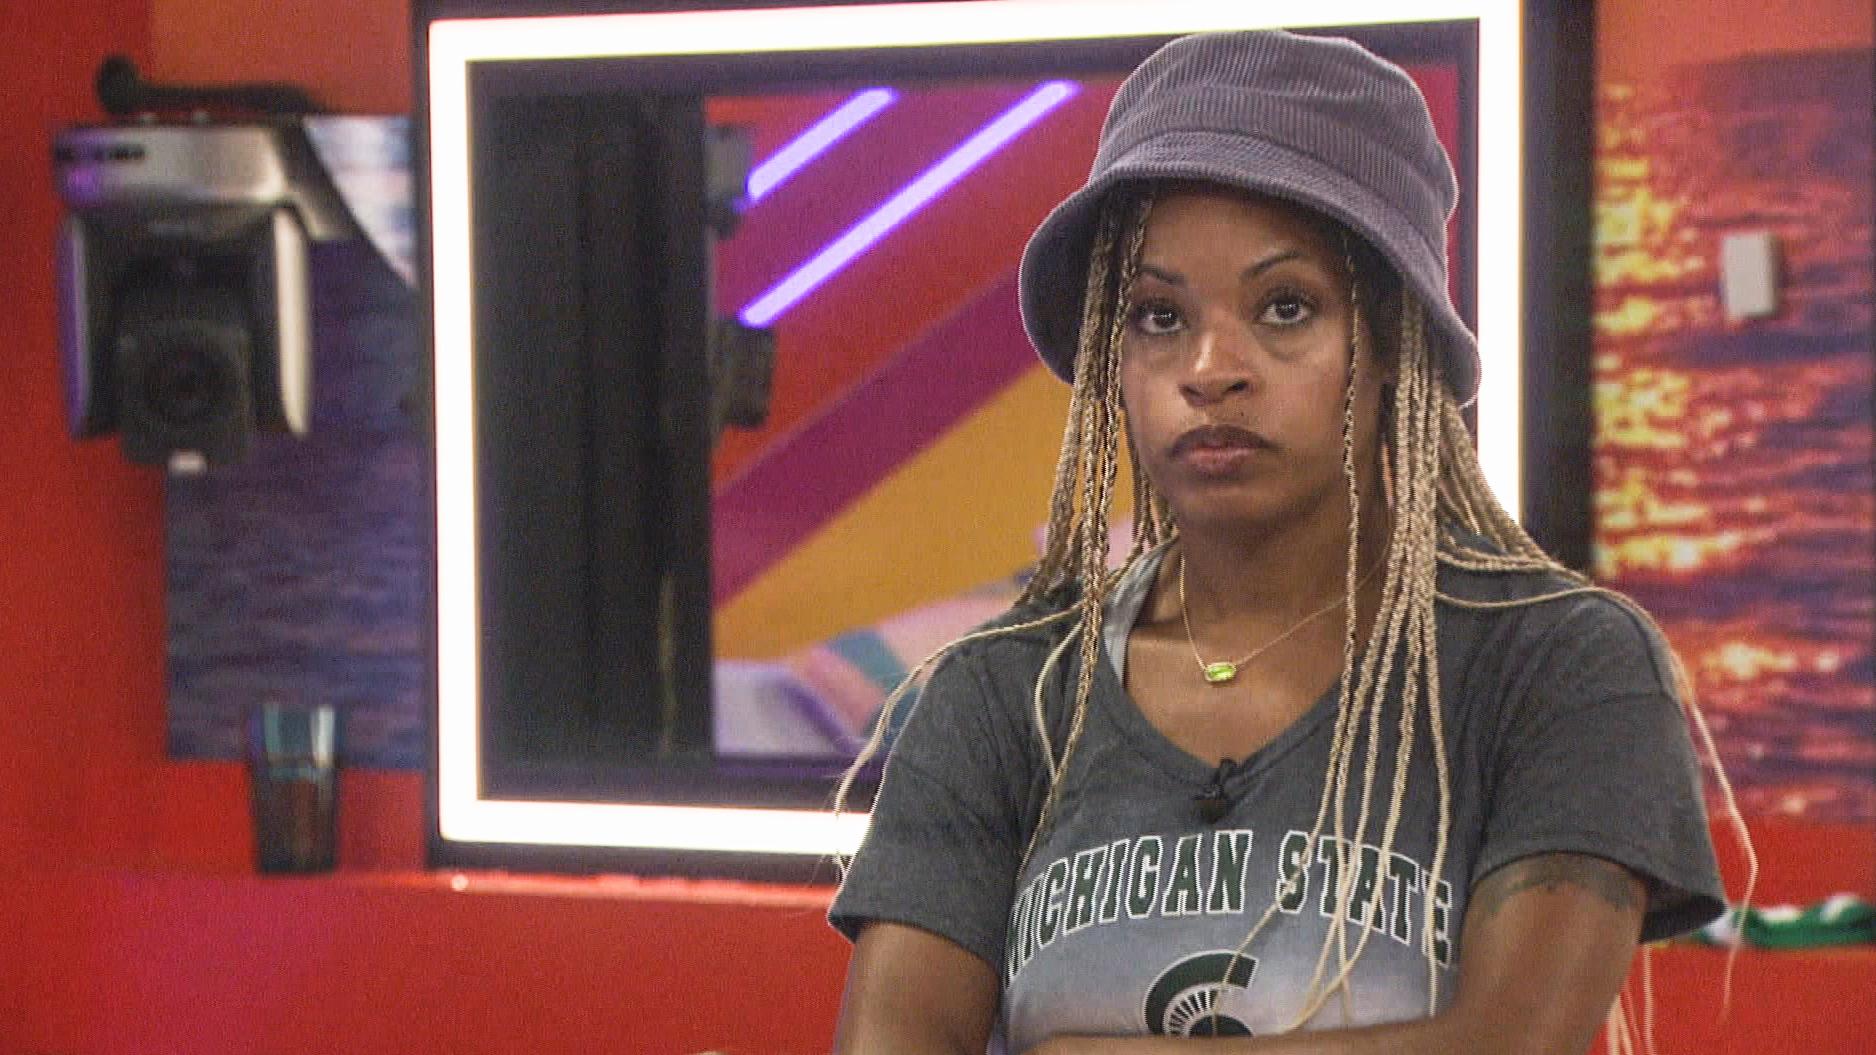 Tiffany Mitchel Big Brother